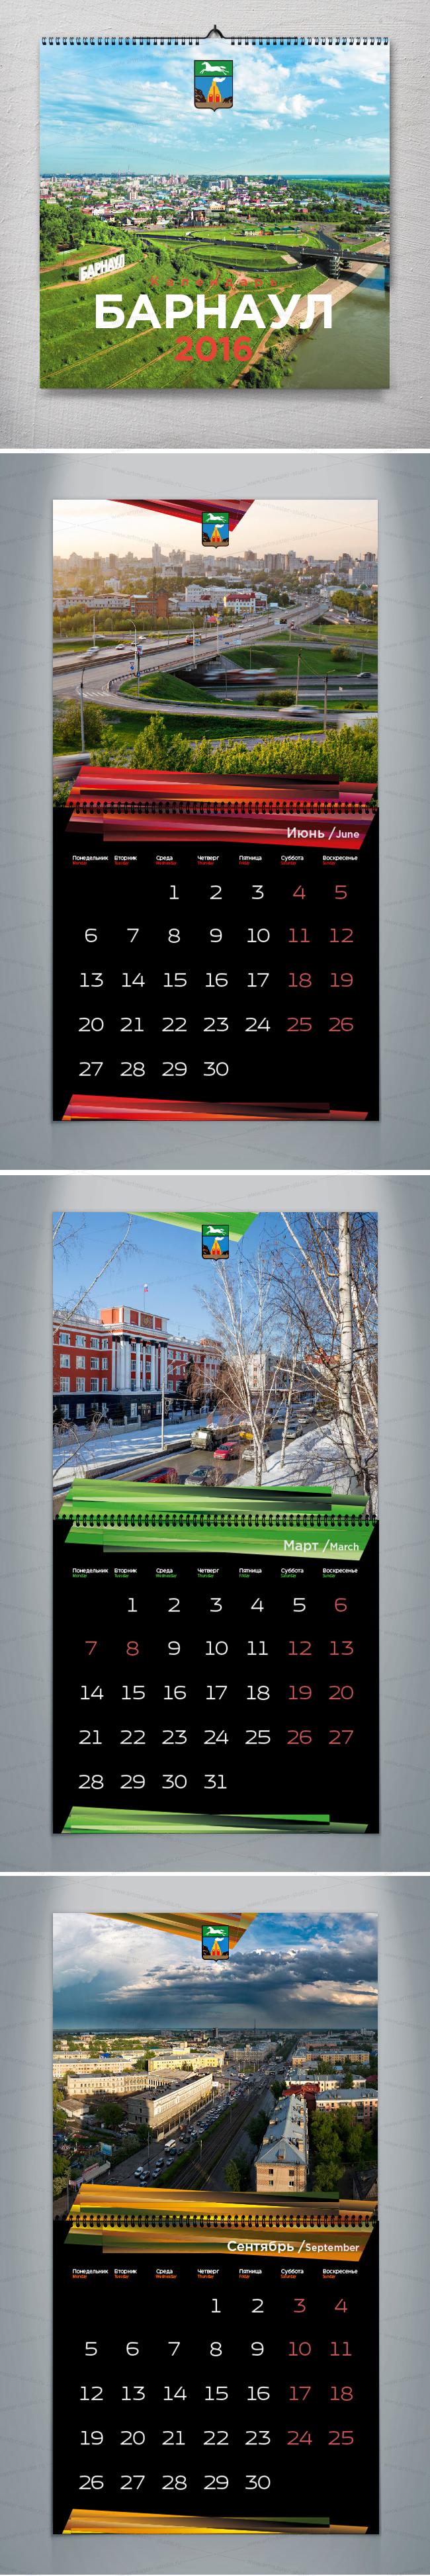 Barnaul_Calendar_2016_am